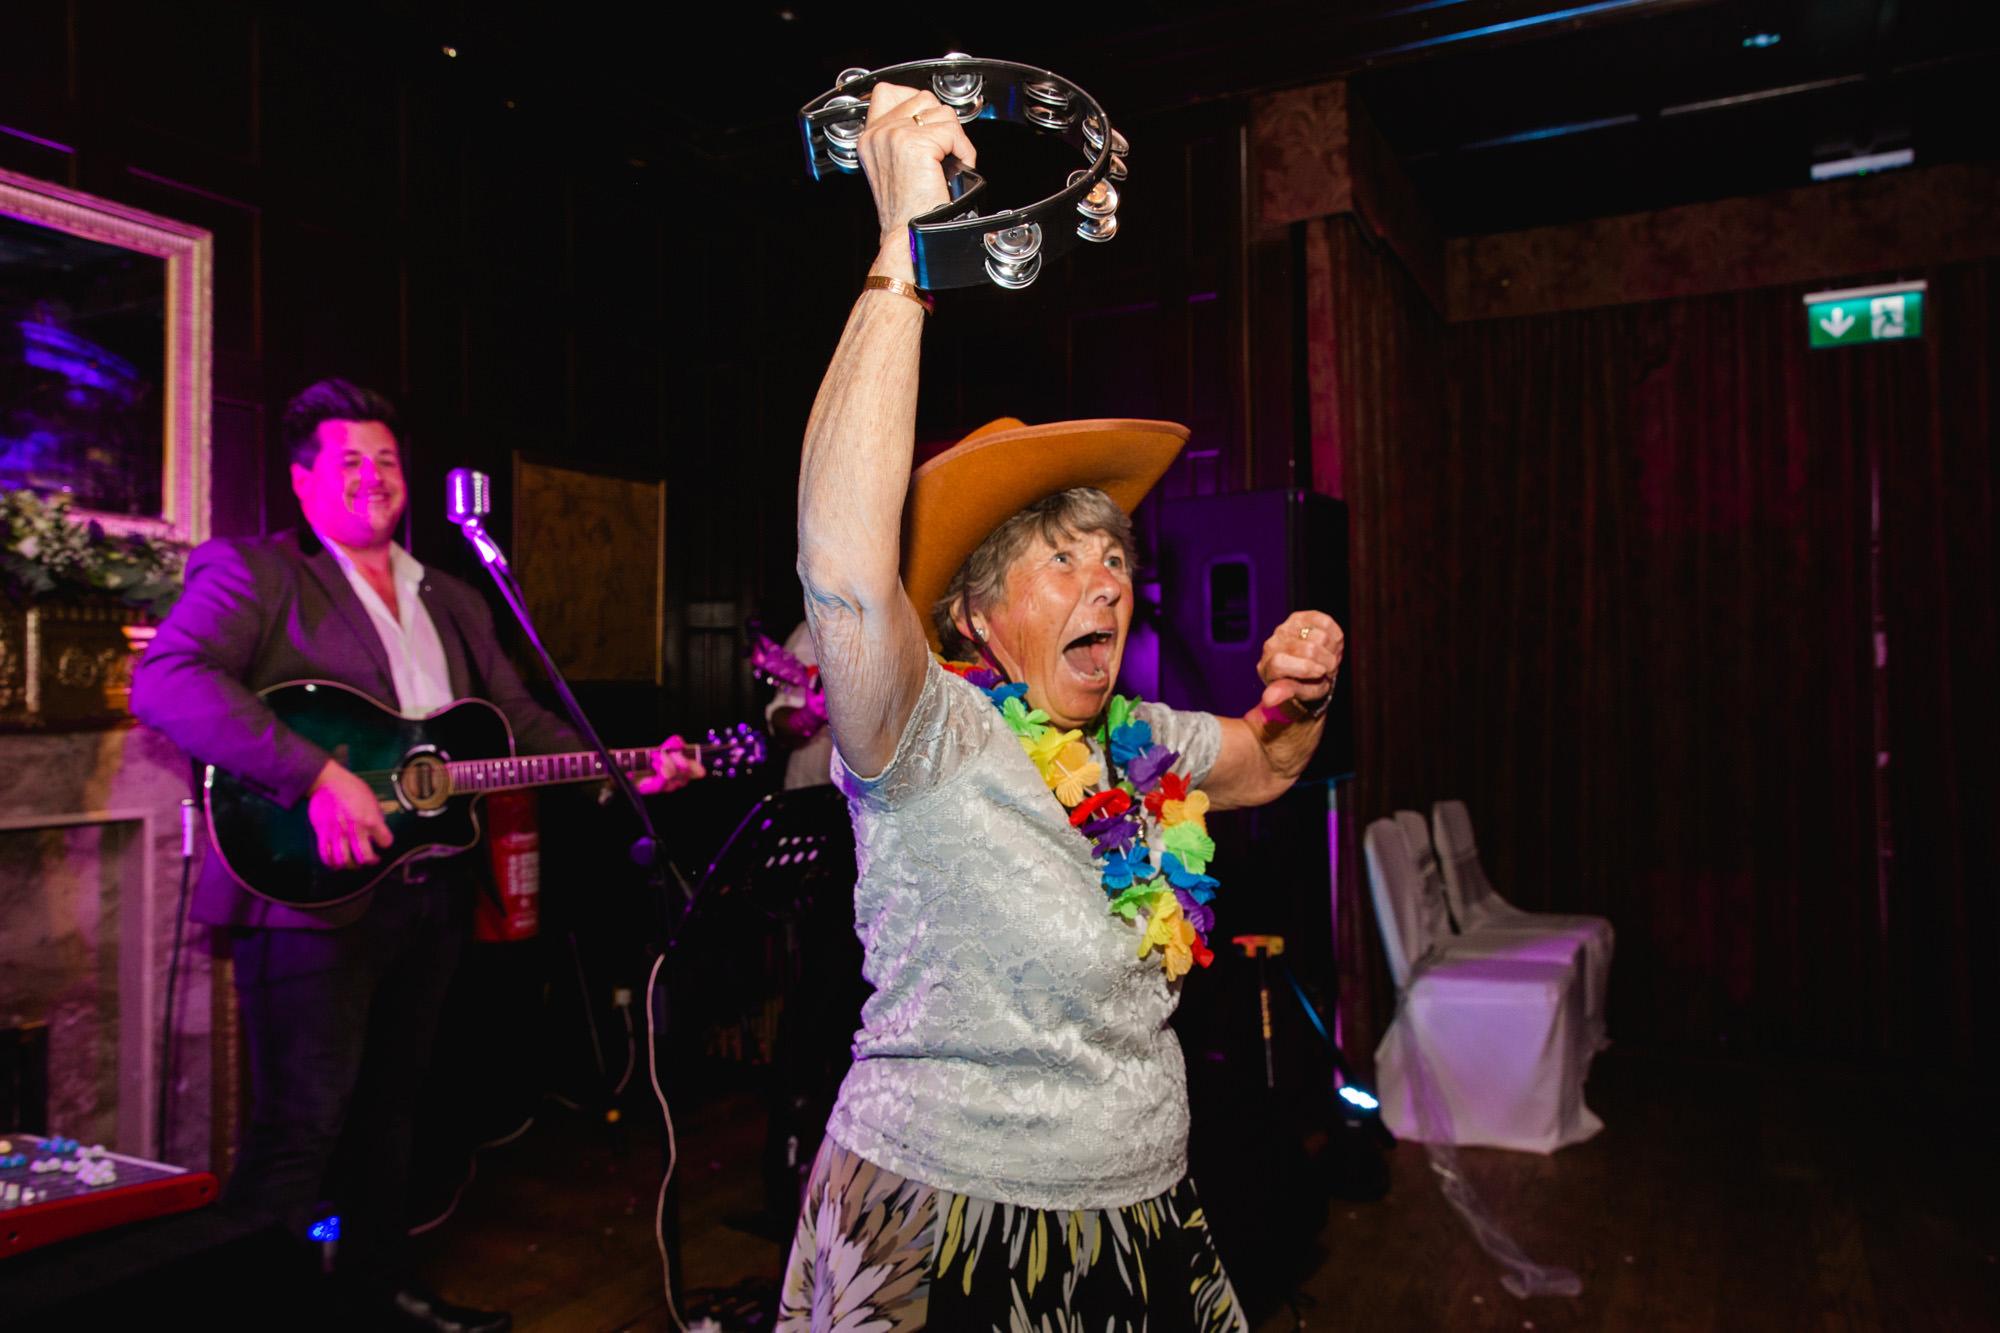 Fun nan dancing at a wedding